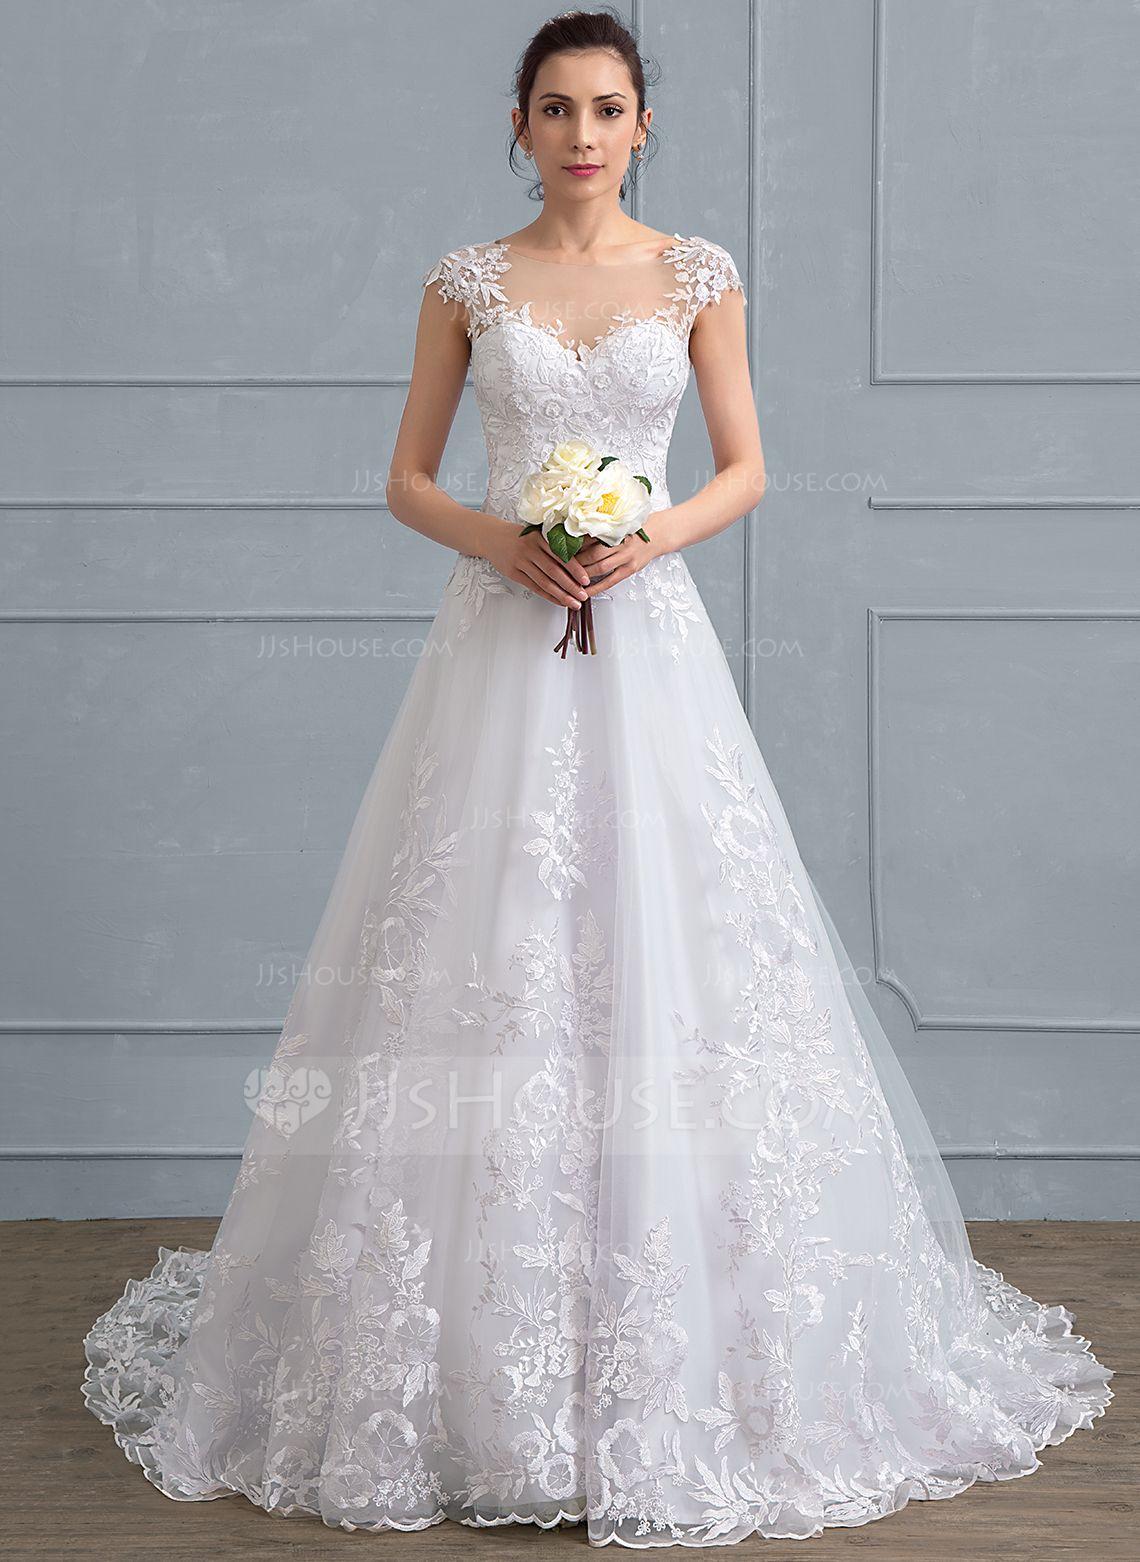 Fine Mooshki Wedding Dresses Inspiration - All Wedding Dresses ...